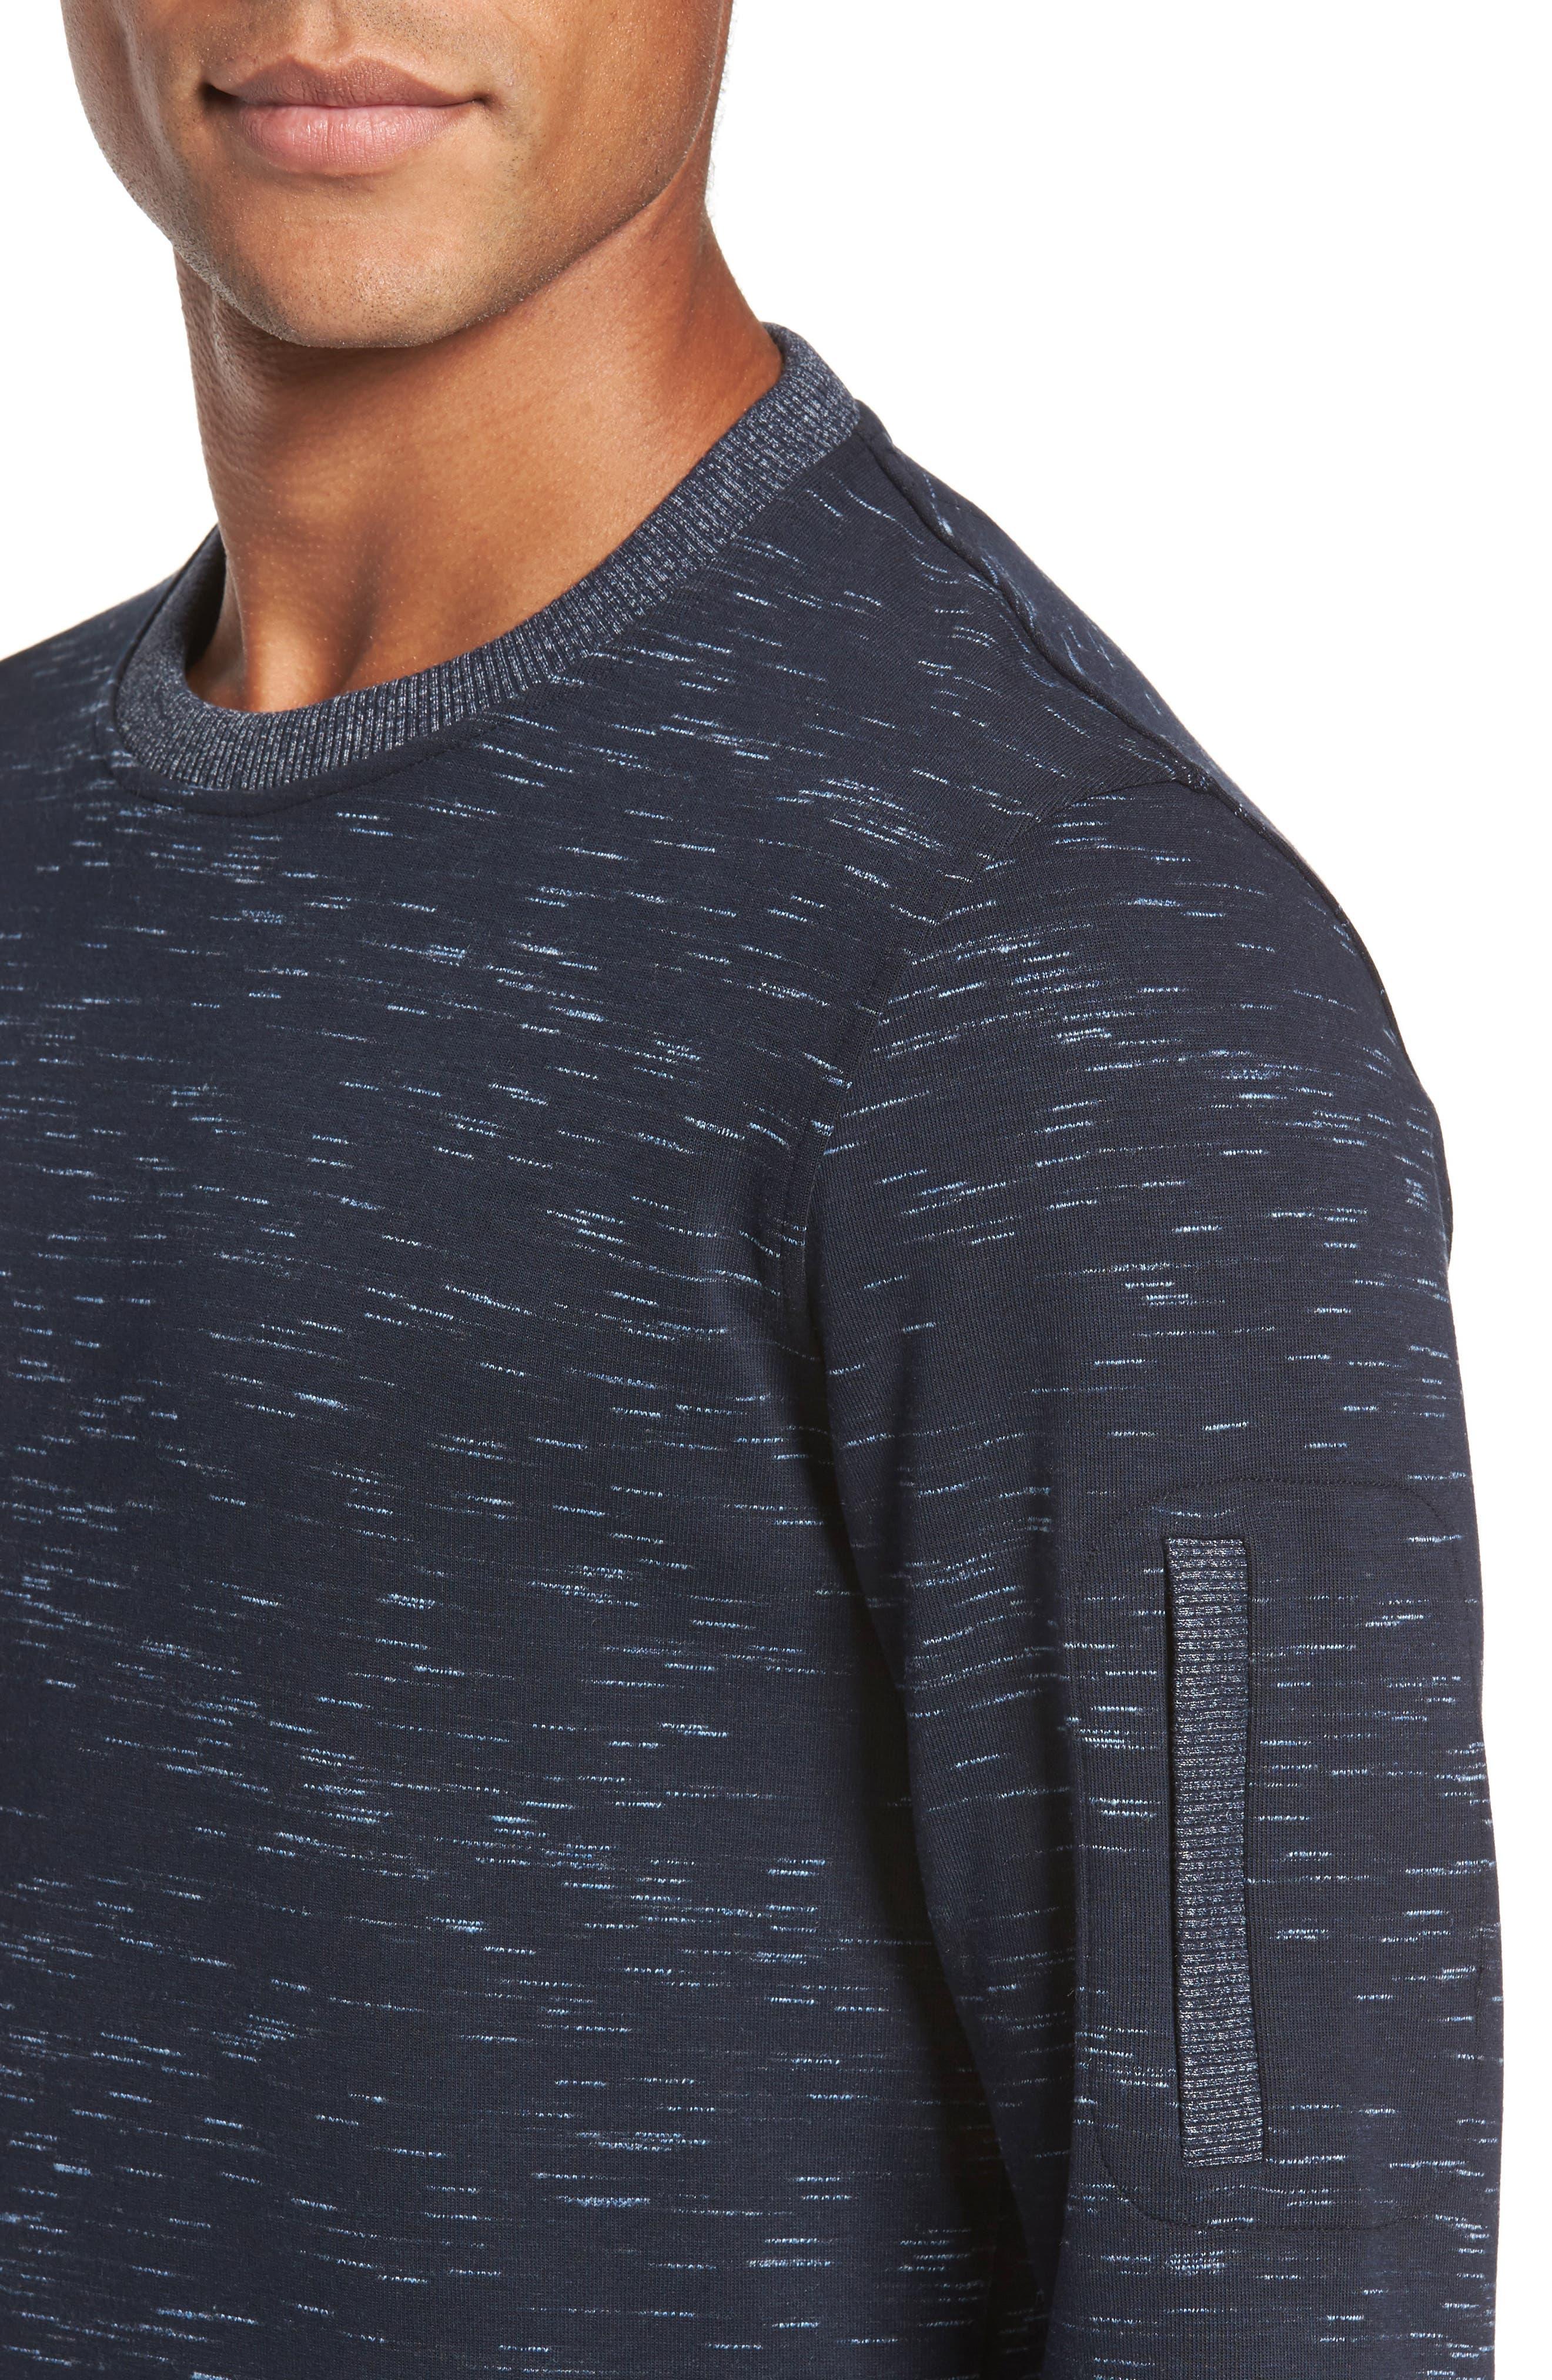 Bepay Jersey Sweatshirt,                             Alternate thumbnail 4, color,                             410